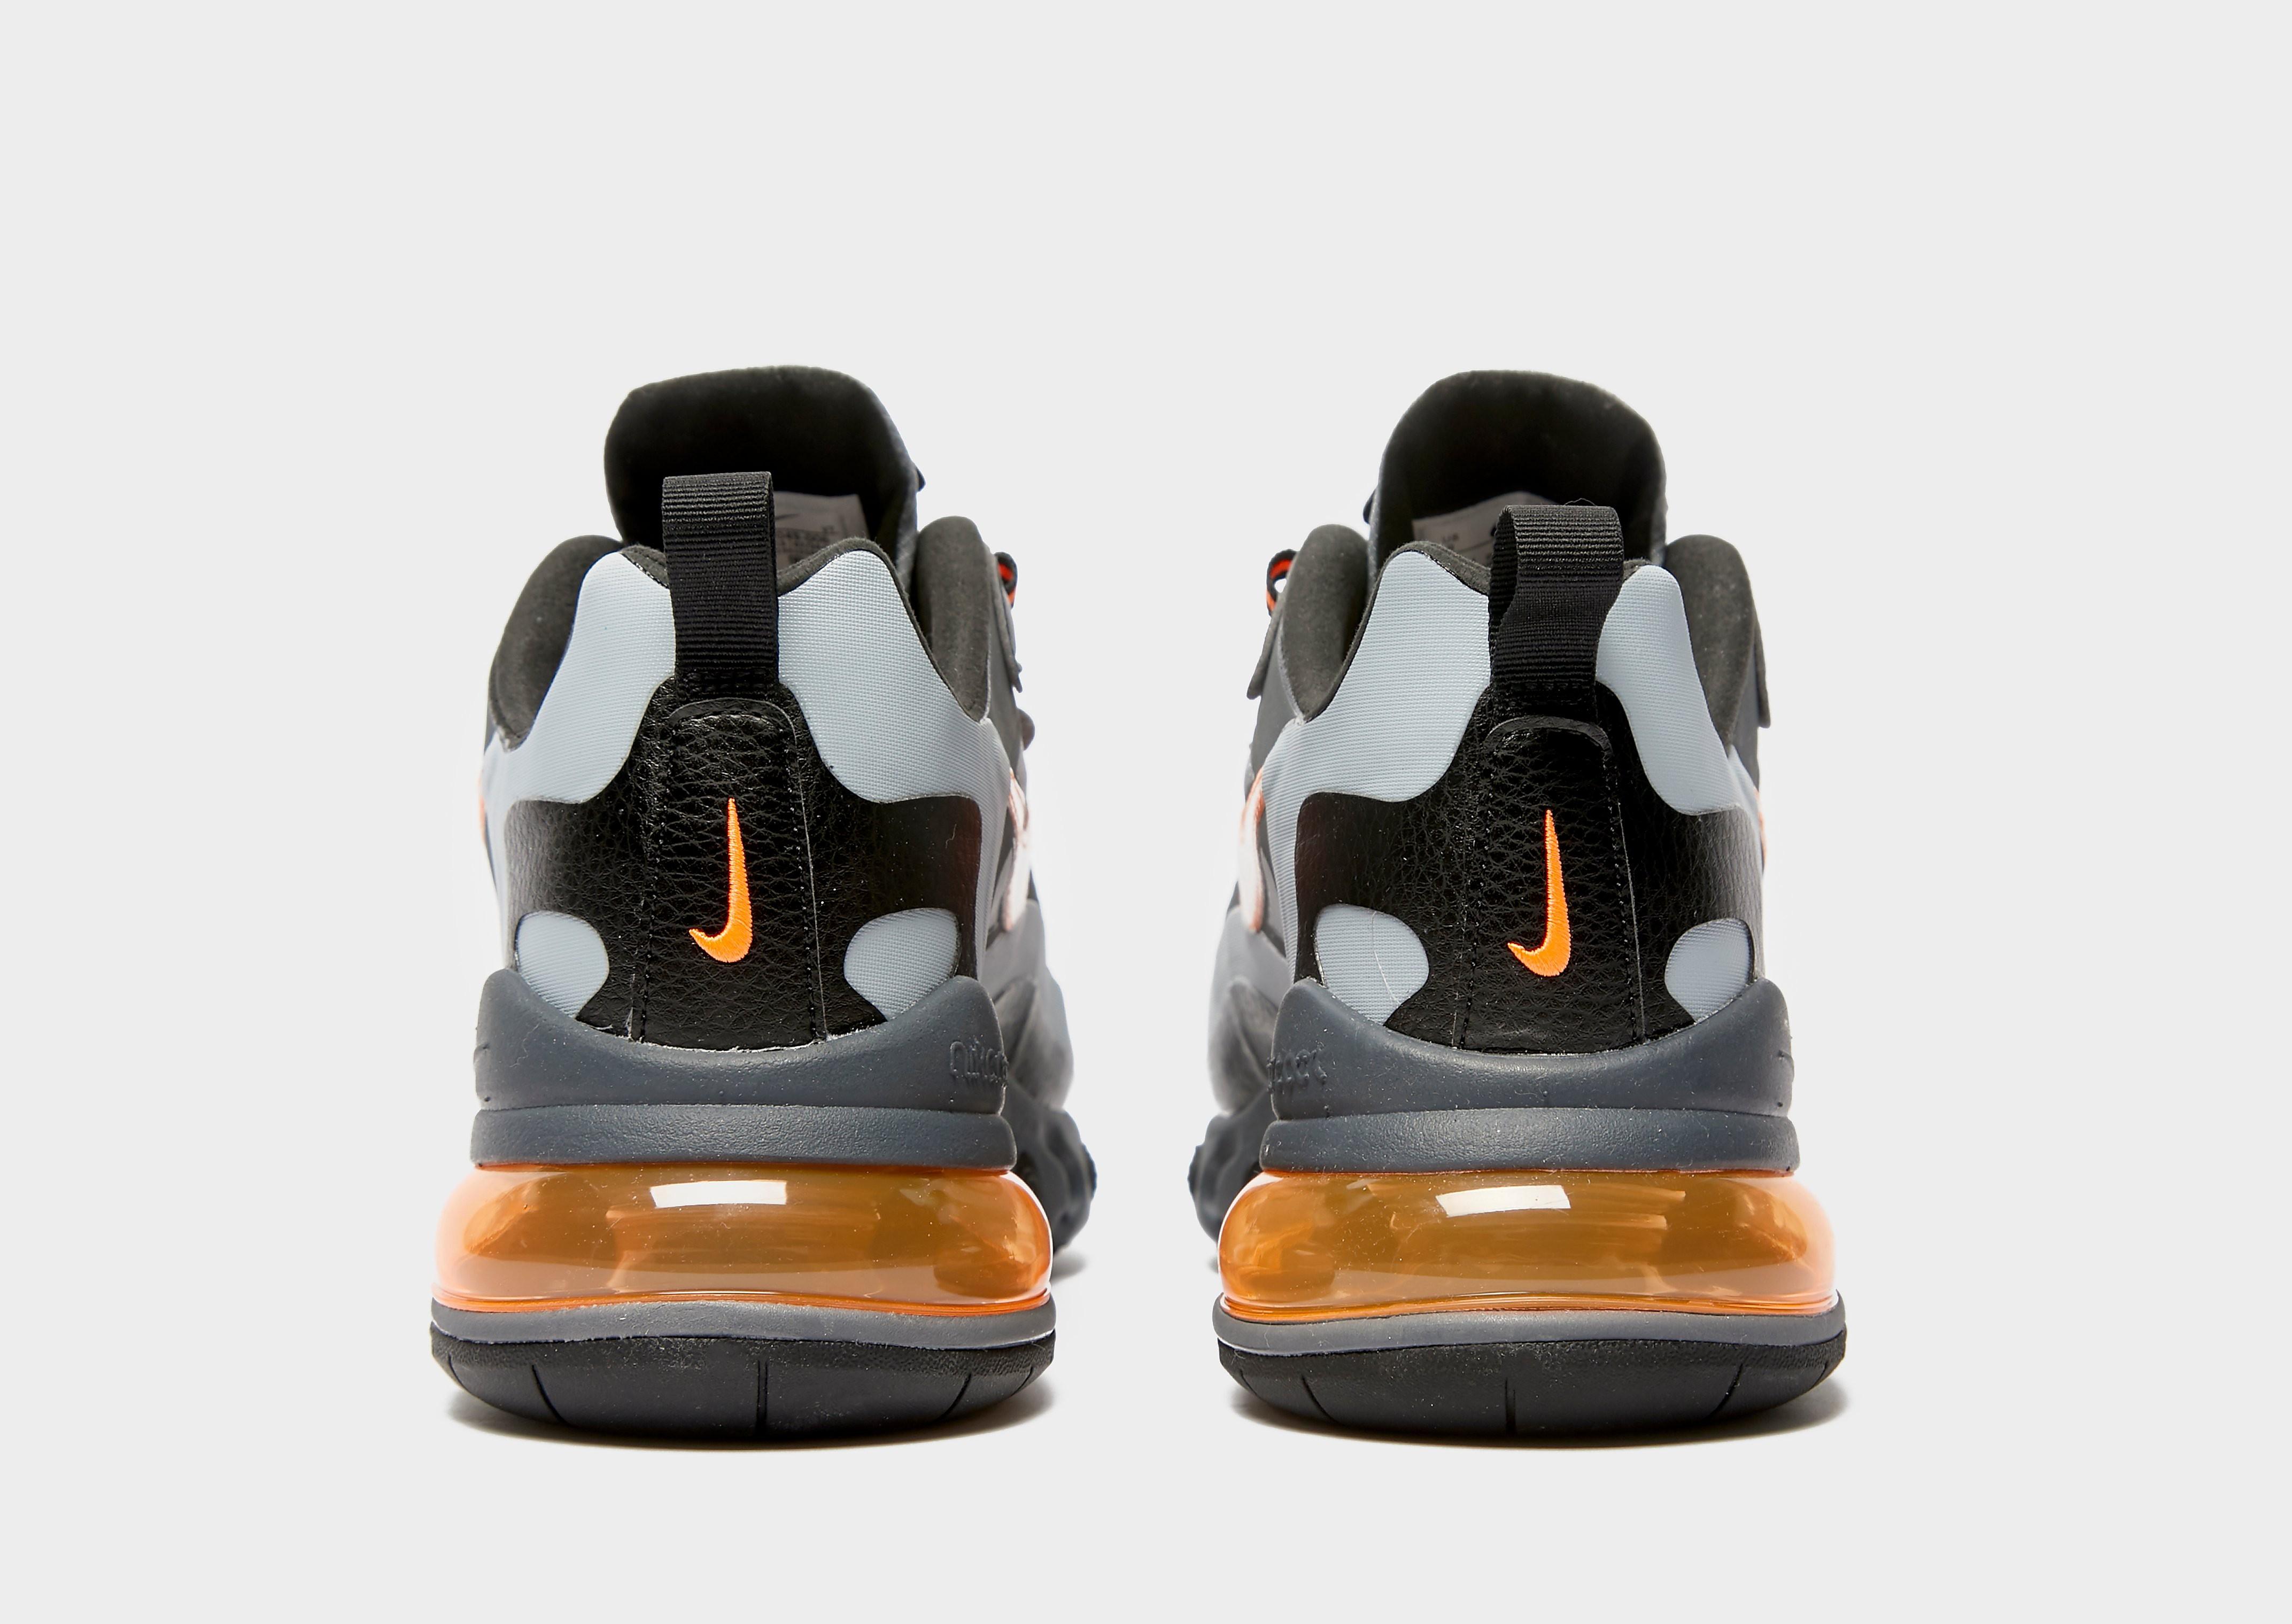 Nike Air Max 270 React Winter Grau Mens, Grau |